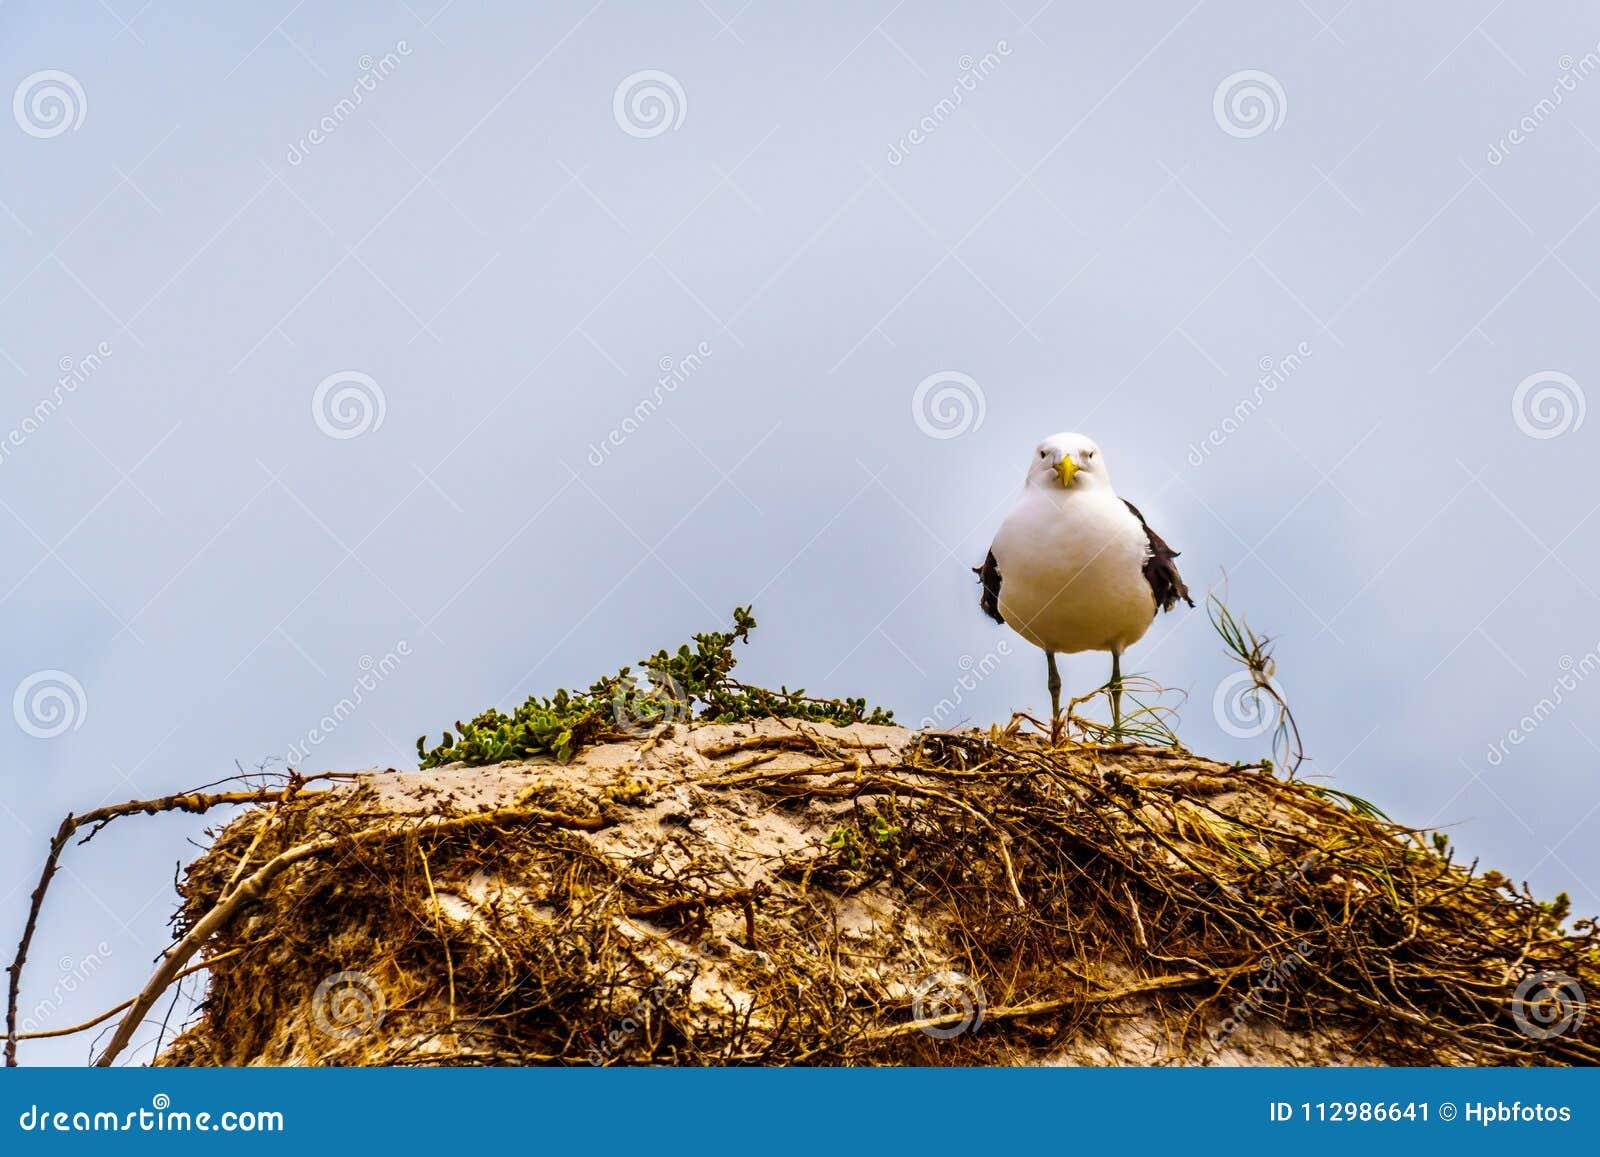 Seagull at Strandfontein beach on Baden Powell Drive between Macassar and Muizenberg near Cape Town